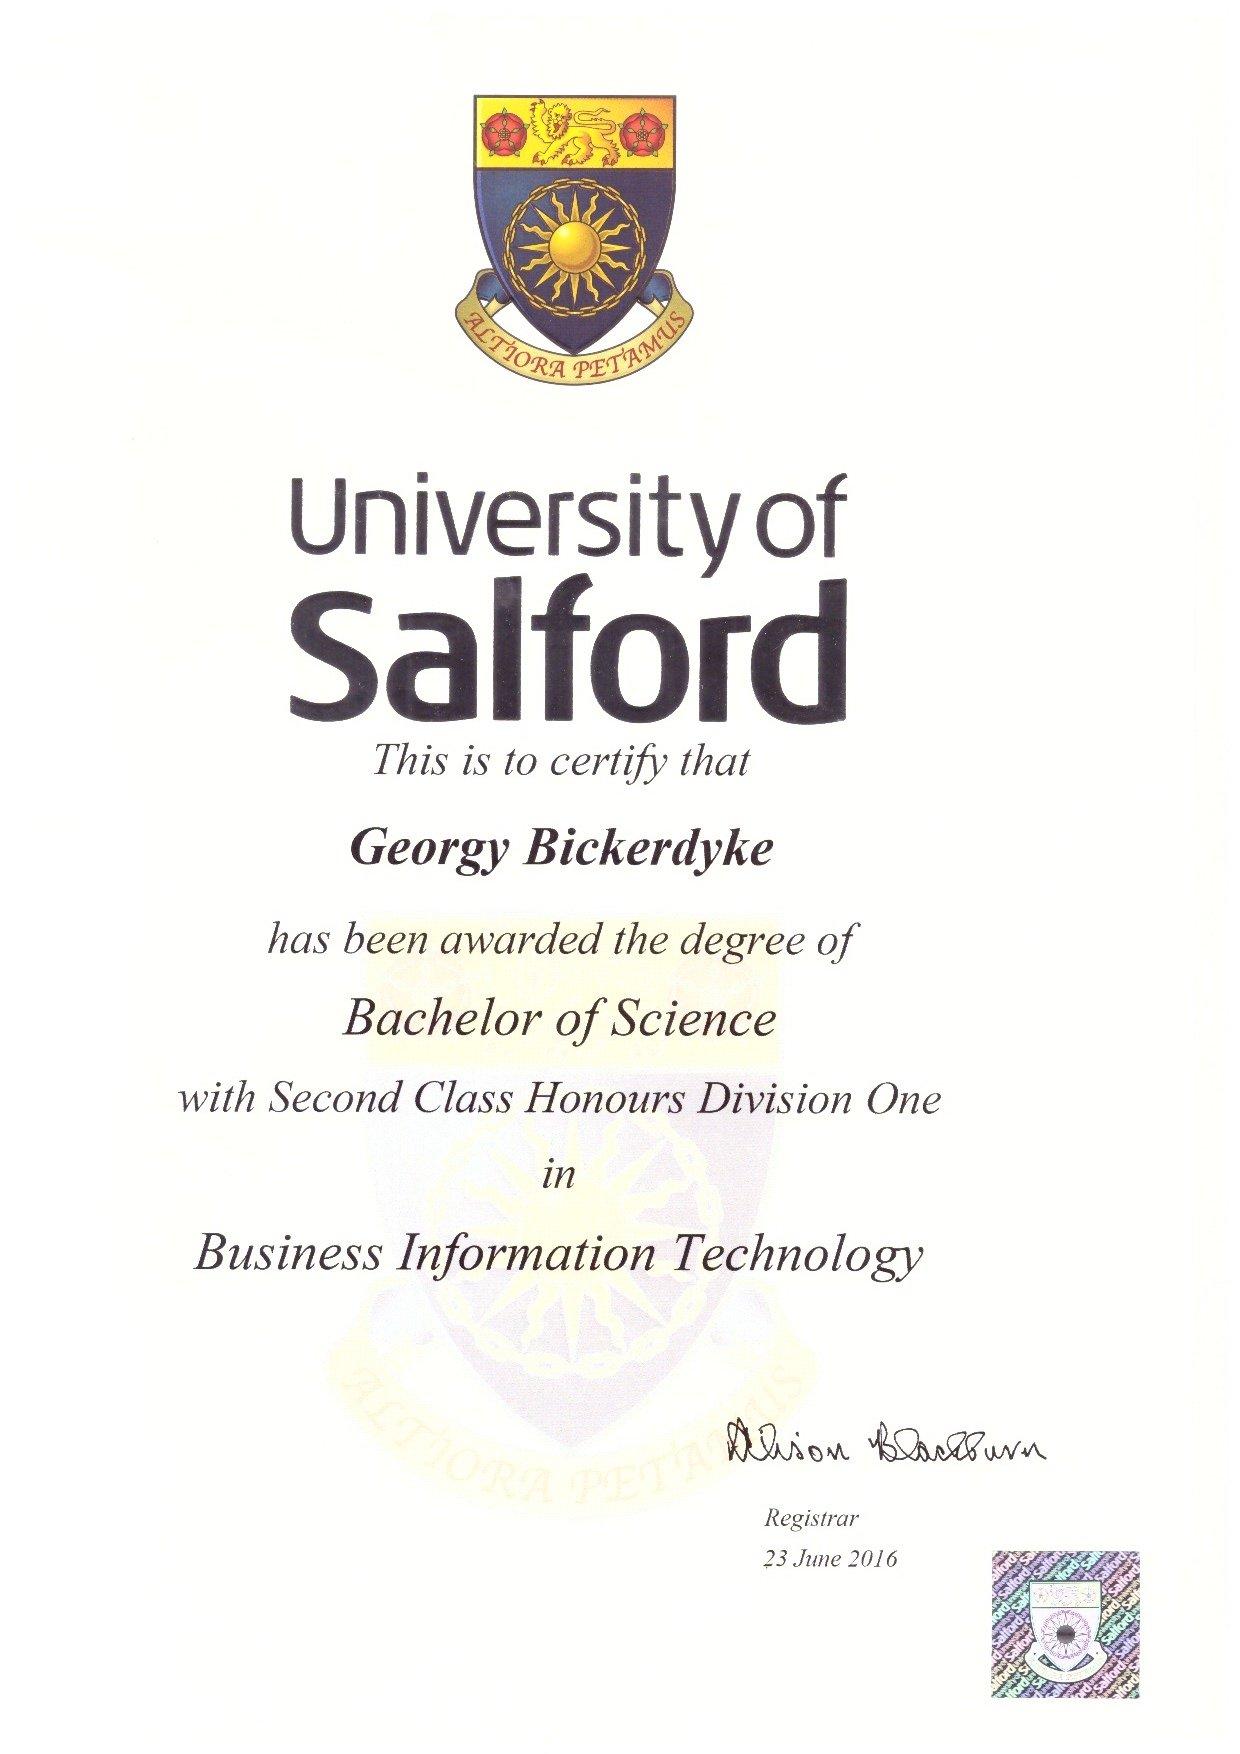 Georgy Bickerdyke Business Information Technology